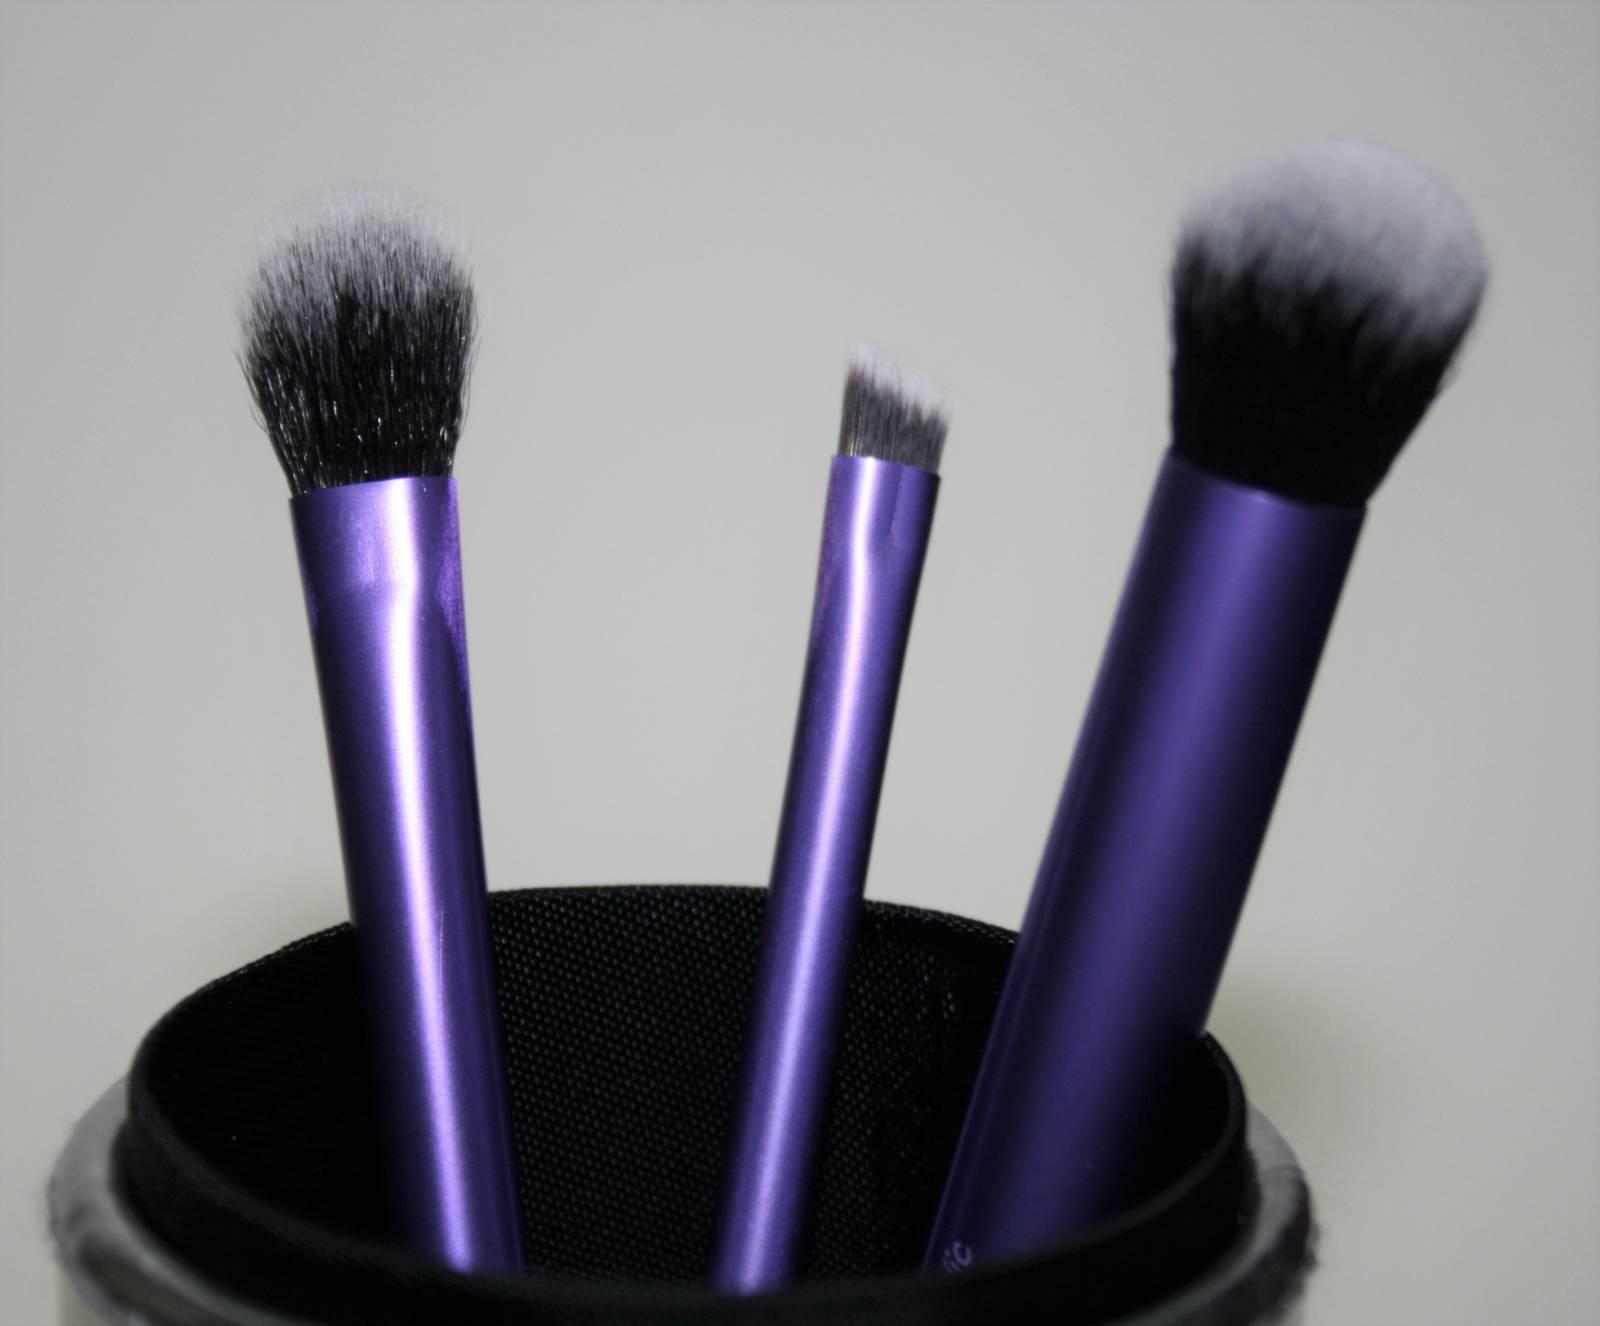 Real Techniques Travel Case Makeup Brush Set Review